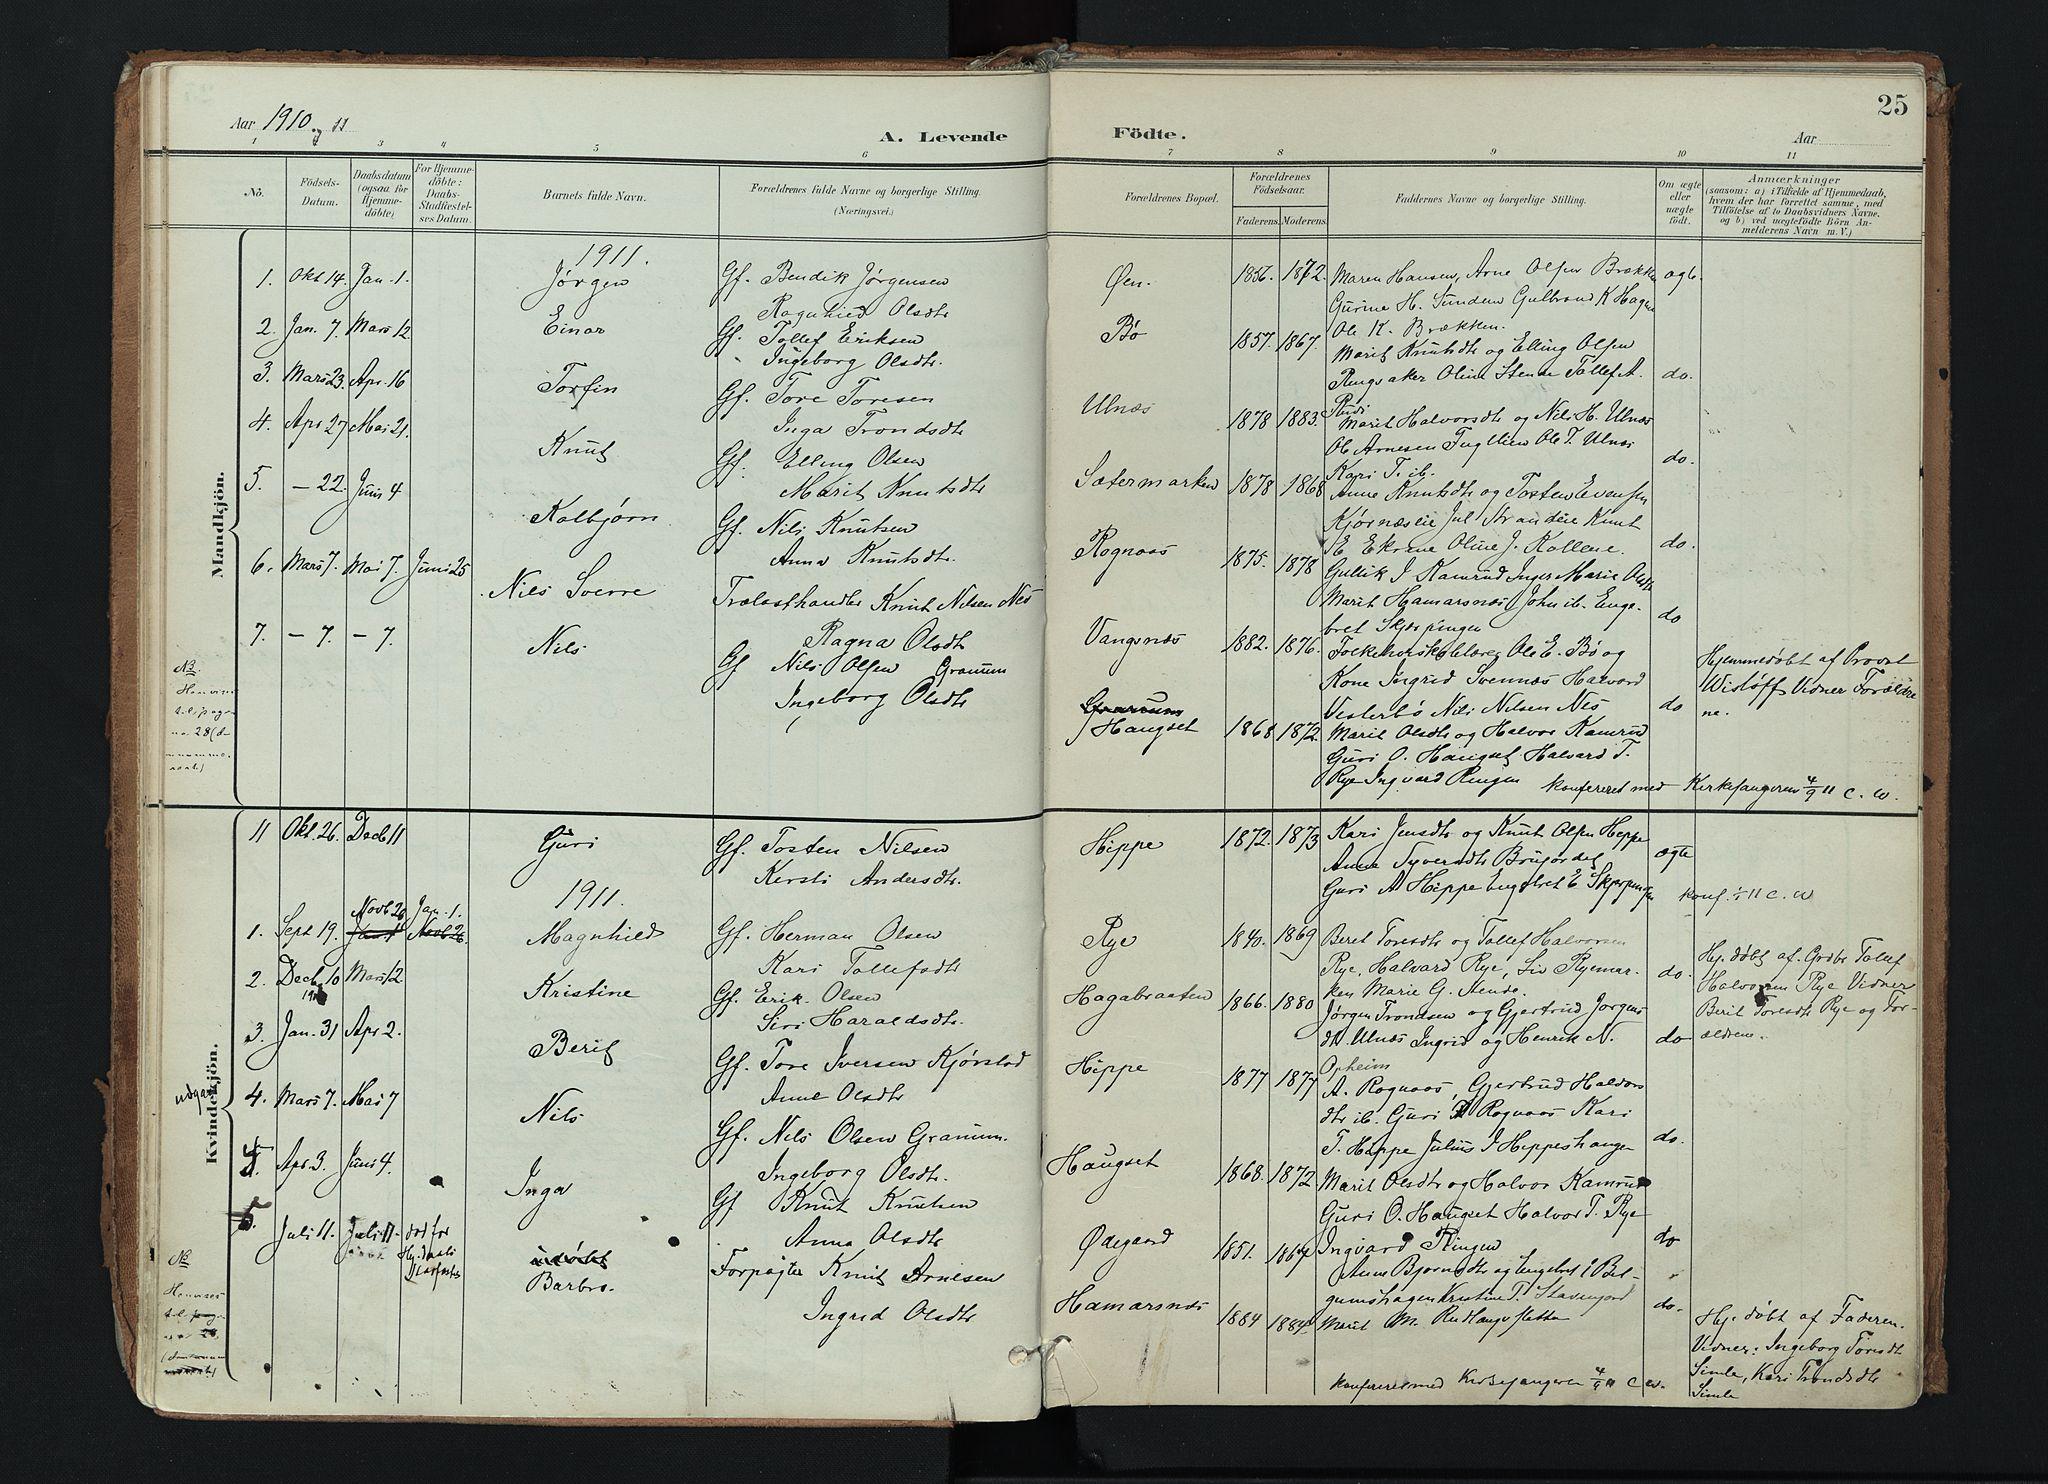 SAH, Nord-Aurdal prestekontor, Ministerialbok nr. 17, 1897-1926, s. 25